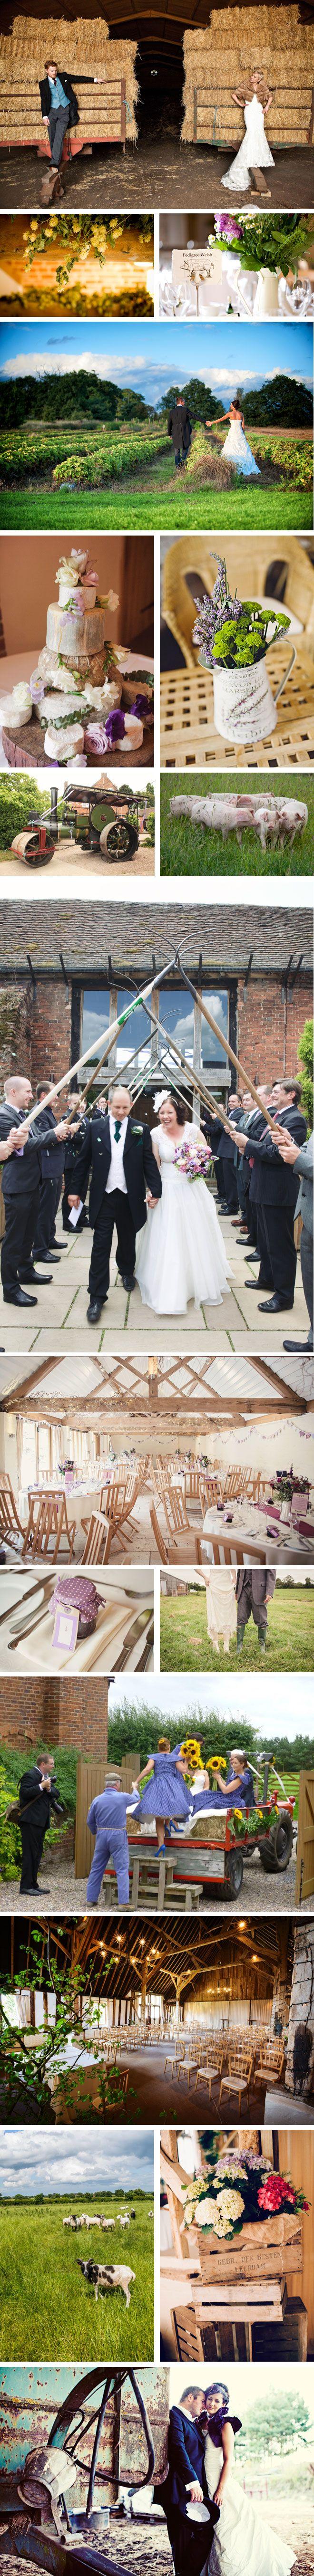 150 best chwv festival weddings images on pinterest festival farm wedding theme ideas and farm wedding venues visit wedding venues solutioingenieria Gallery